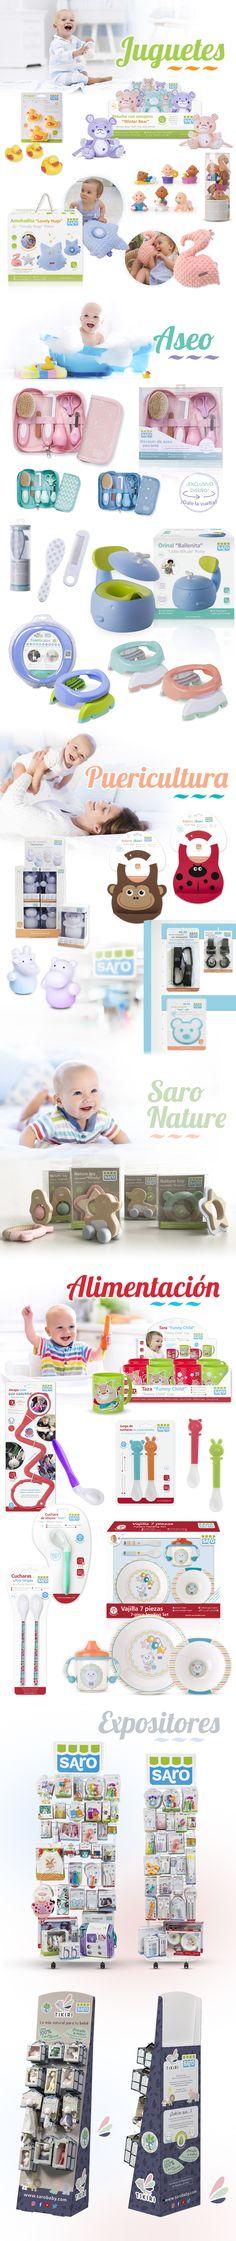 Saro Baby - unaquesededicaalbranding